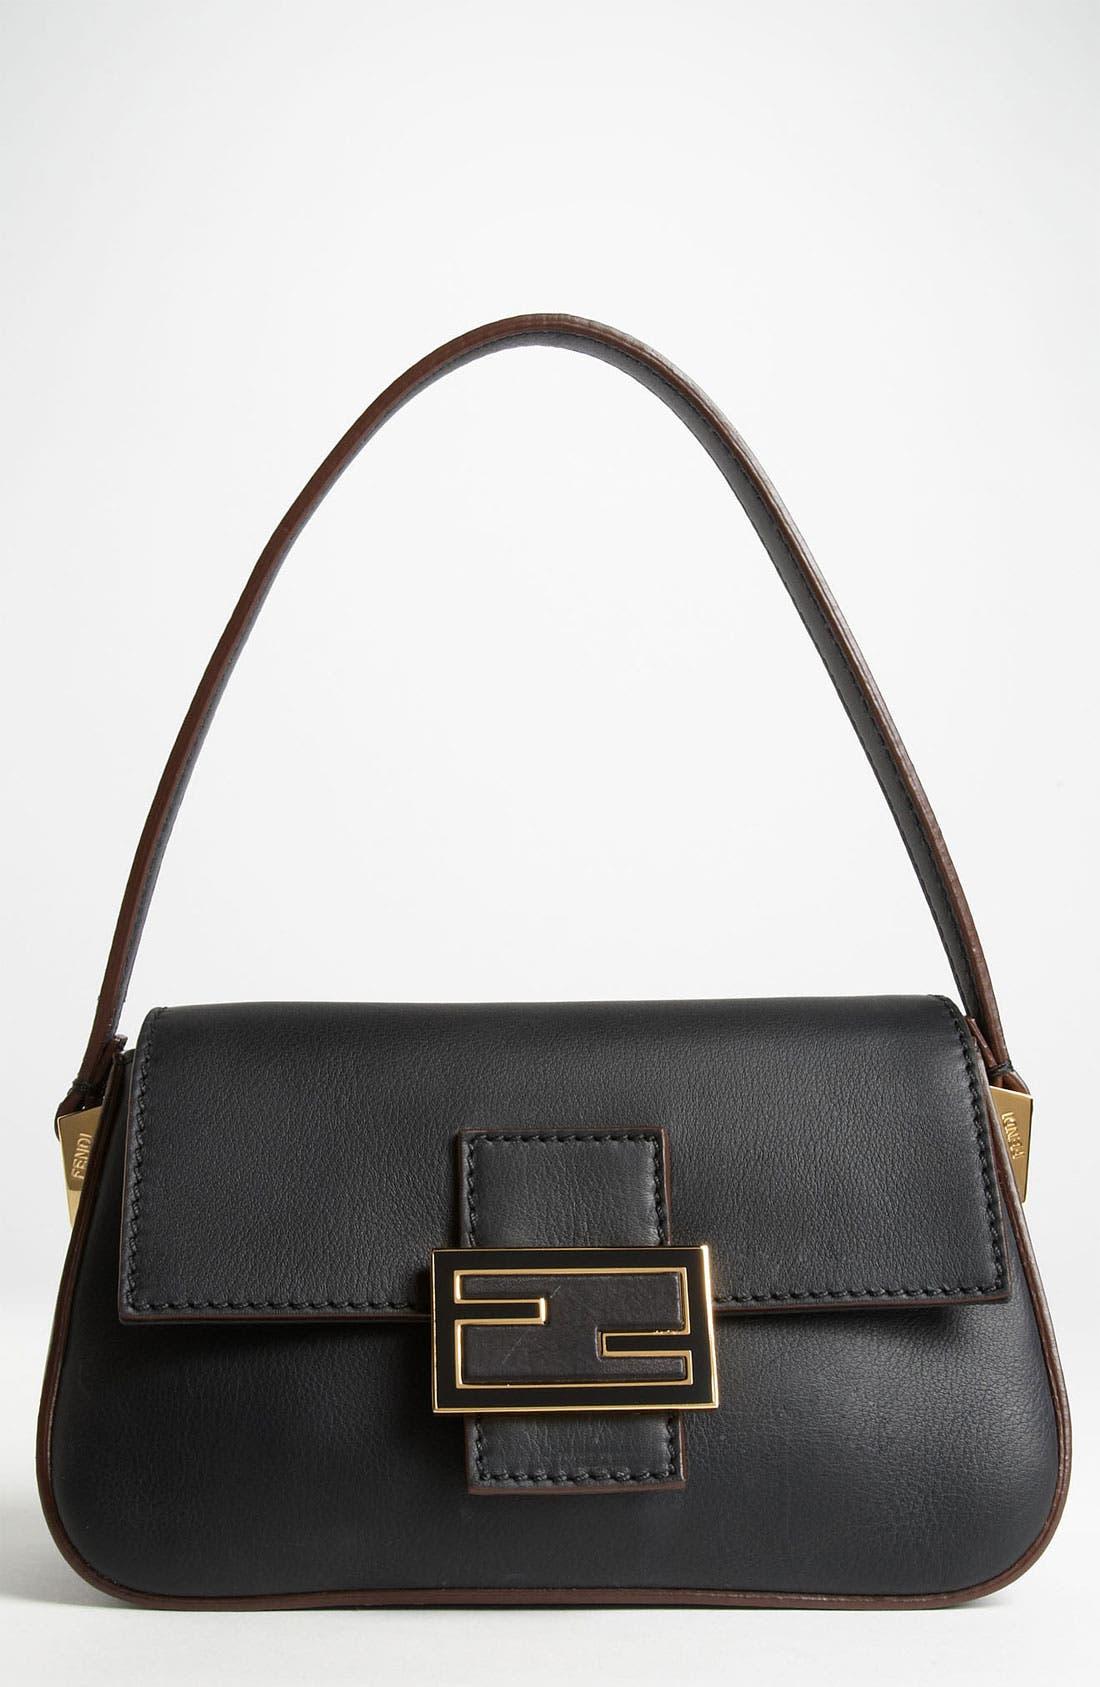 Main Image - Fendi 'Mamma - Mini' Leather Shoulder Bag